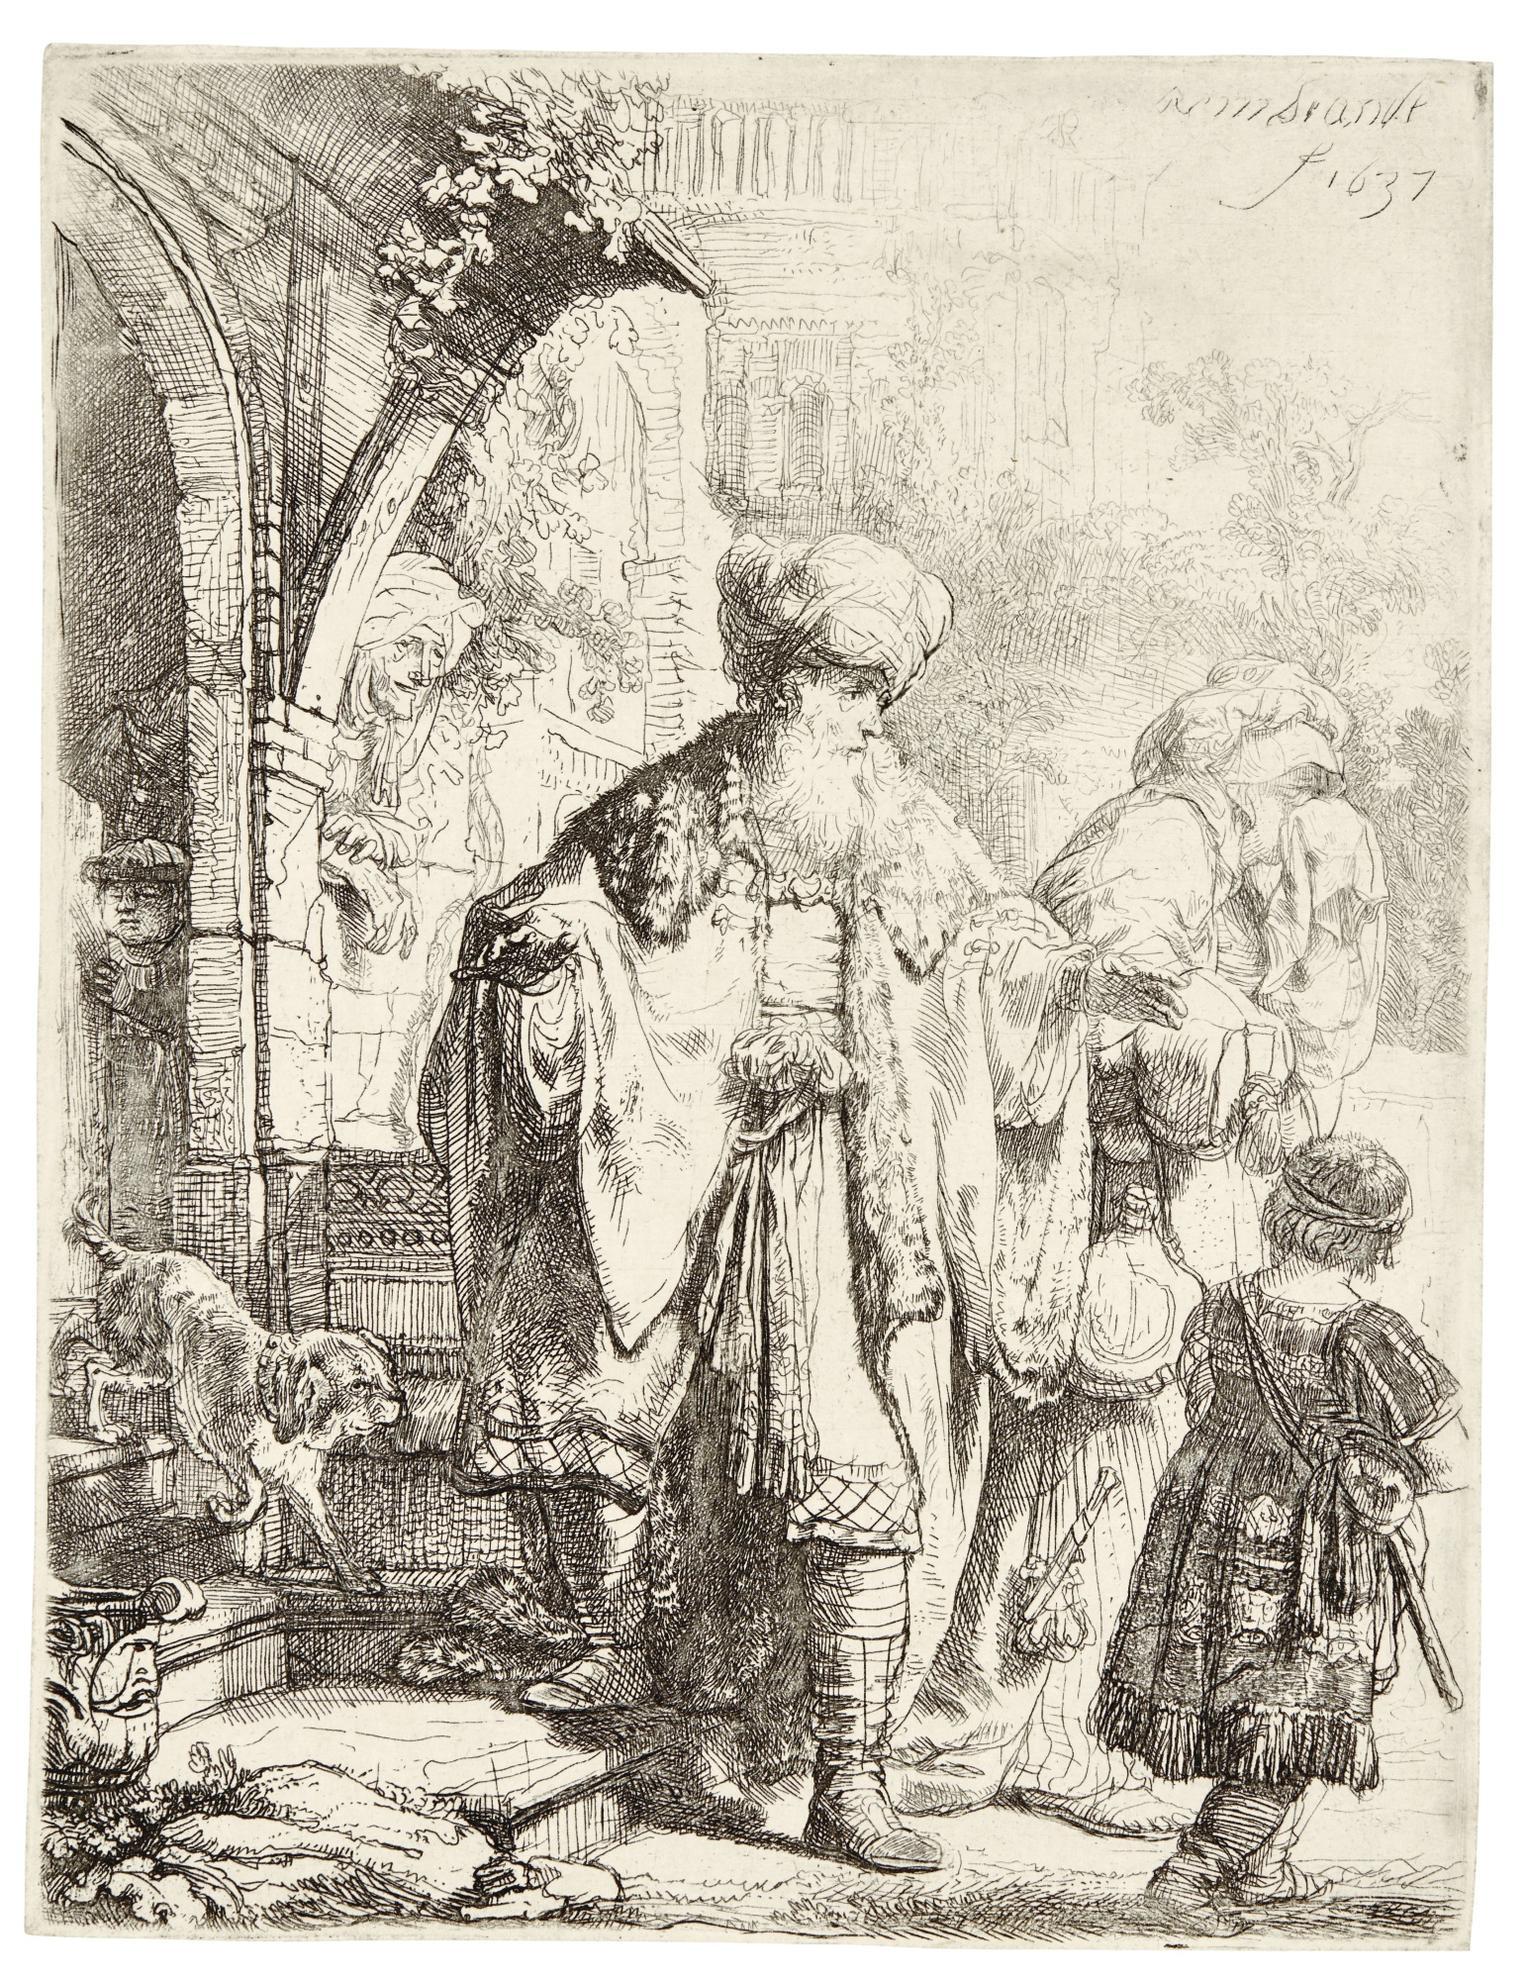 Rembrandt van Rijn-Abraham Casting Out Hagar And Ishmael (B., Holl. 30; New Holl. 166; H. 149)-1637